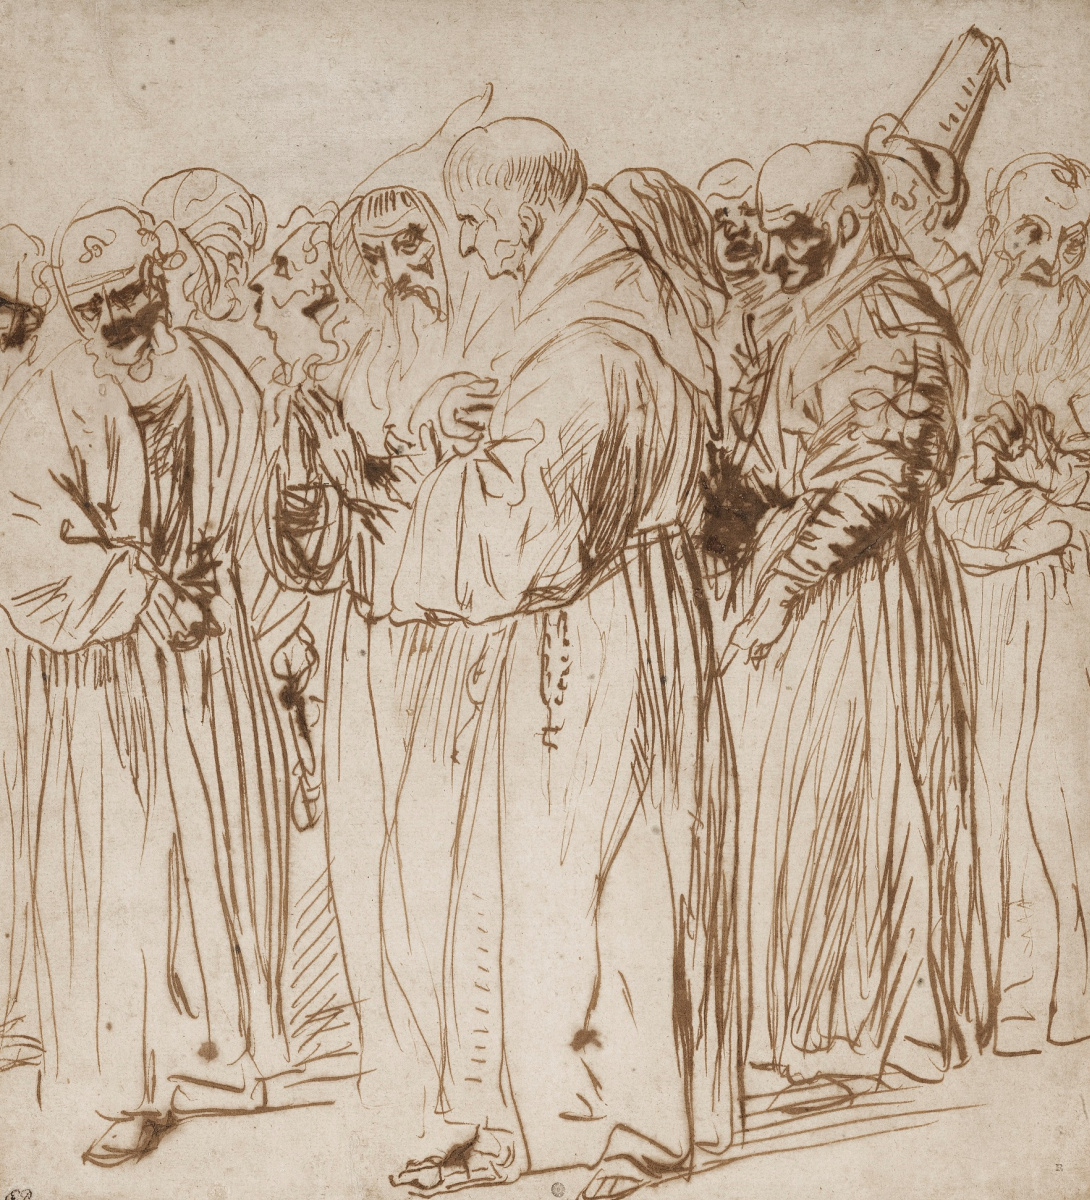 Ян Ливенс. Группа монахов